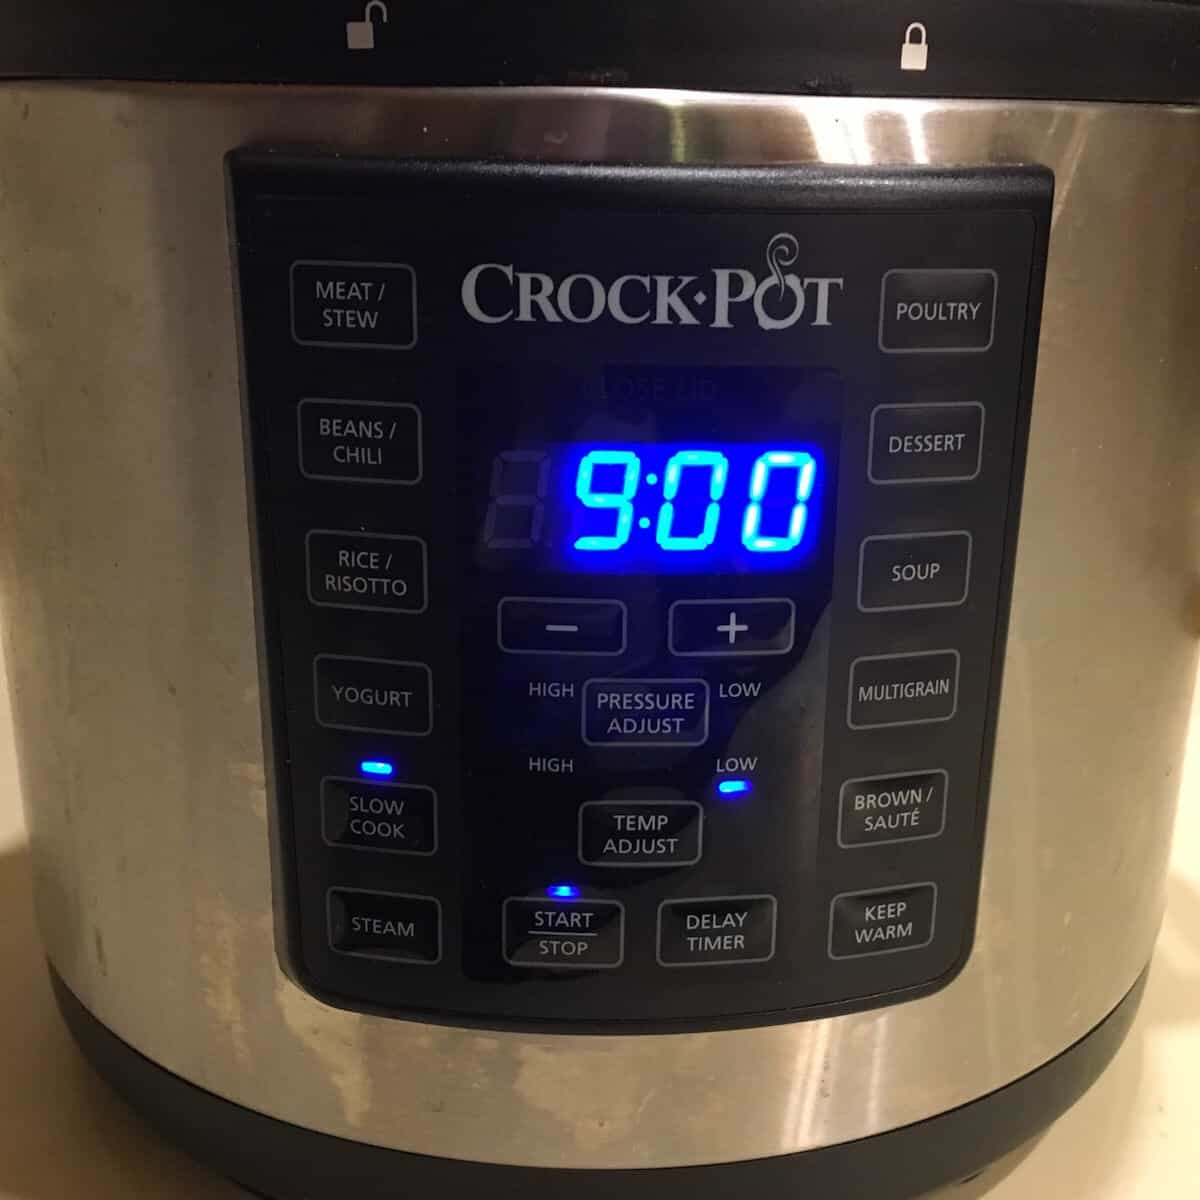 crock pot set for overnight